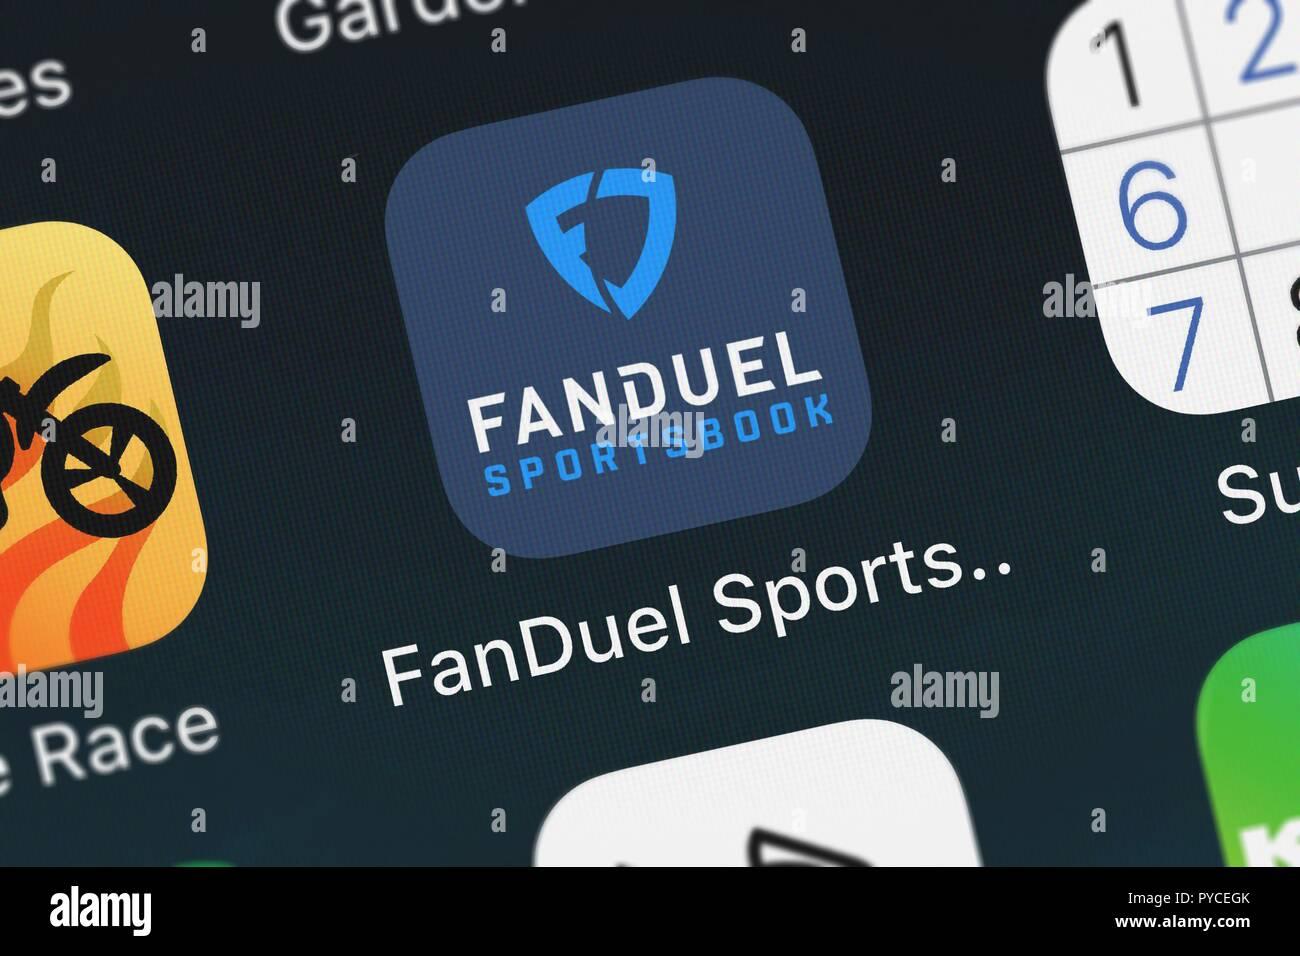 Londres, Reino Unido - 26 de octubre de 2018: Primer plano de FanDuel, Inc. la popular app FanDuel Sportsbook. Foto de stock